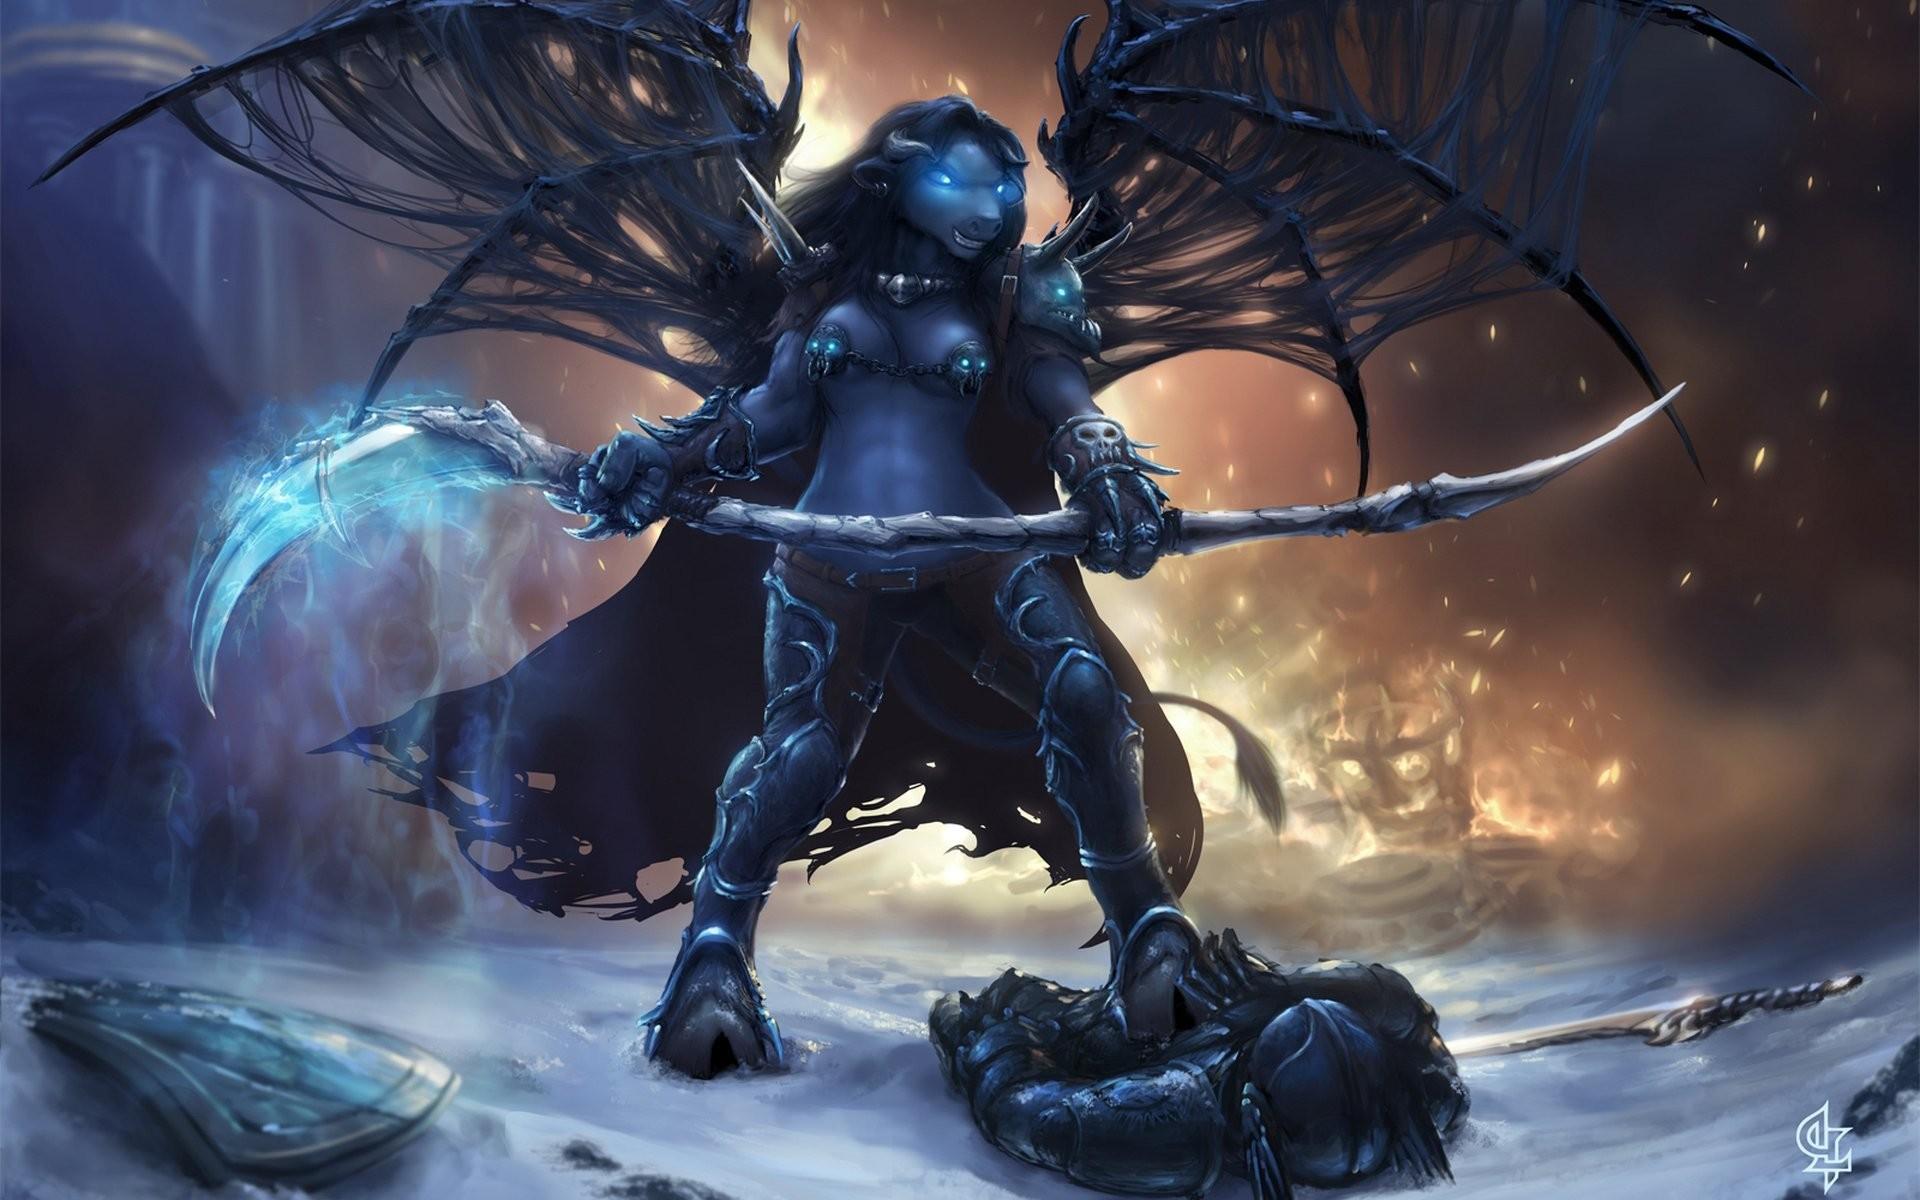 world of warcraft wow deathknight fanart tauren pvp spit wings flame magic